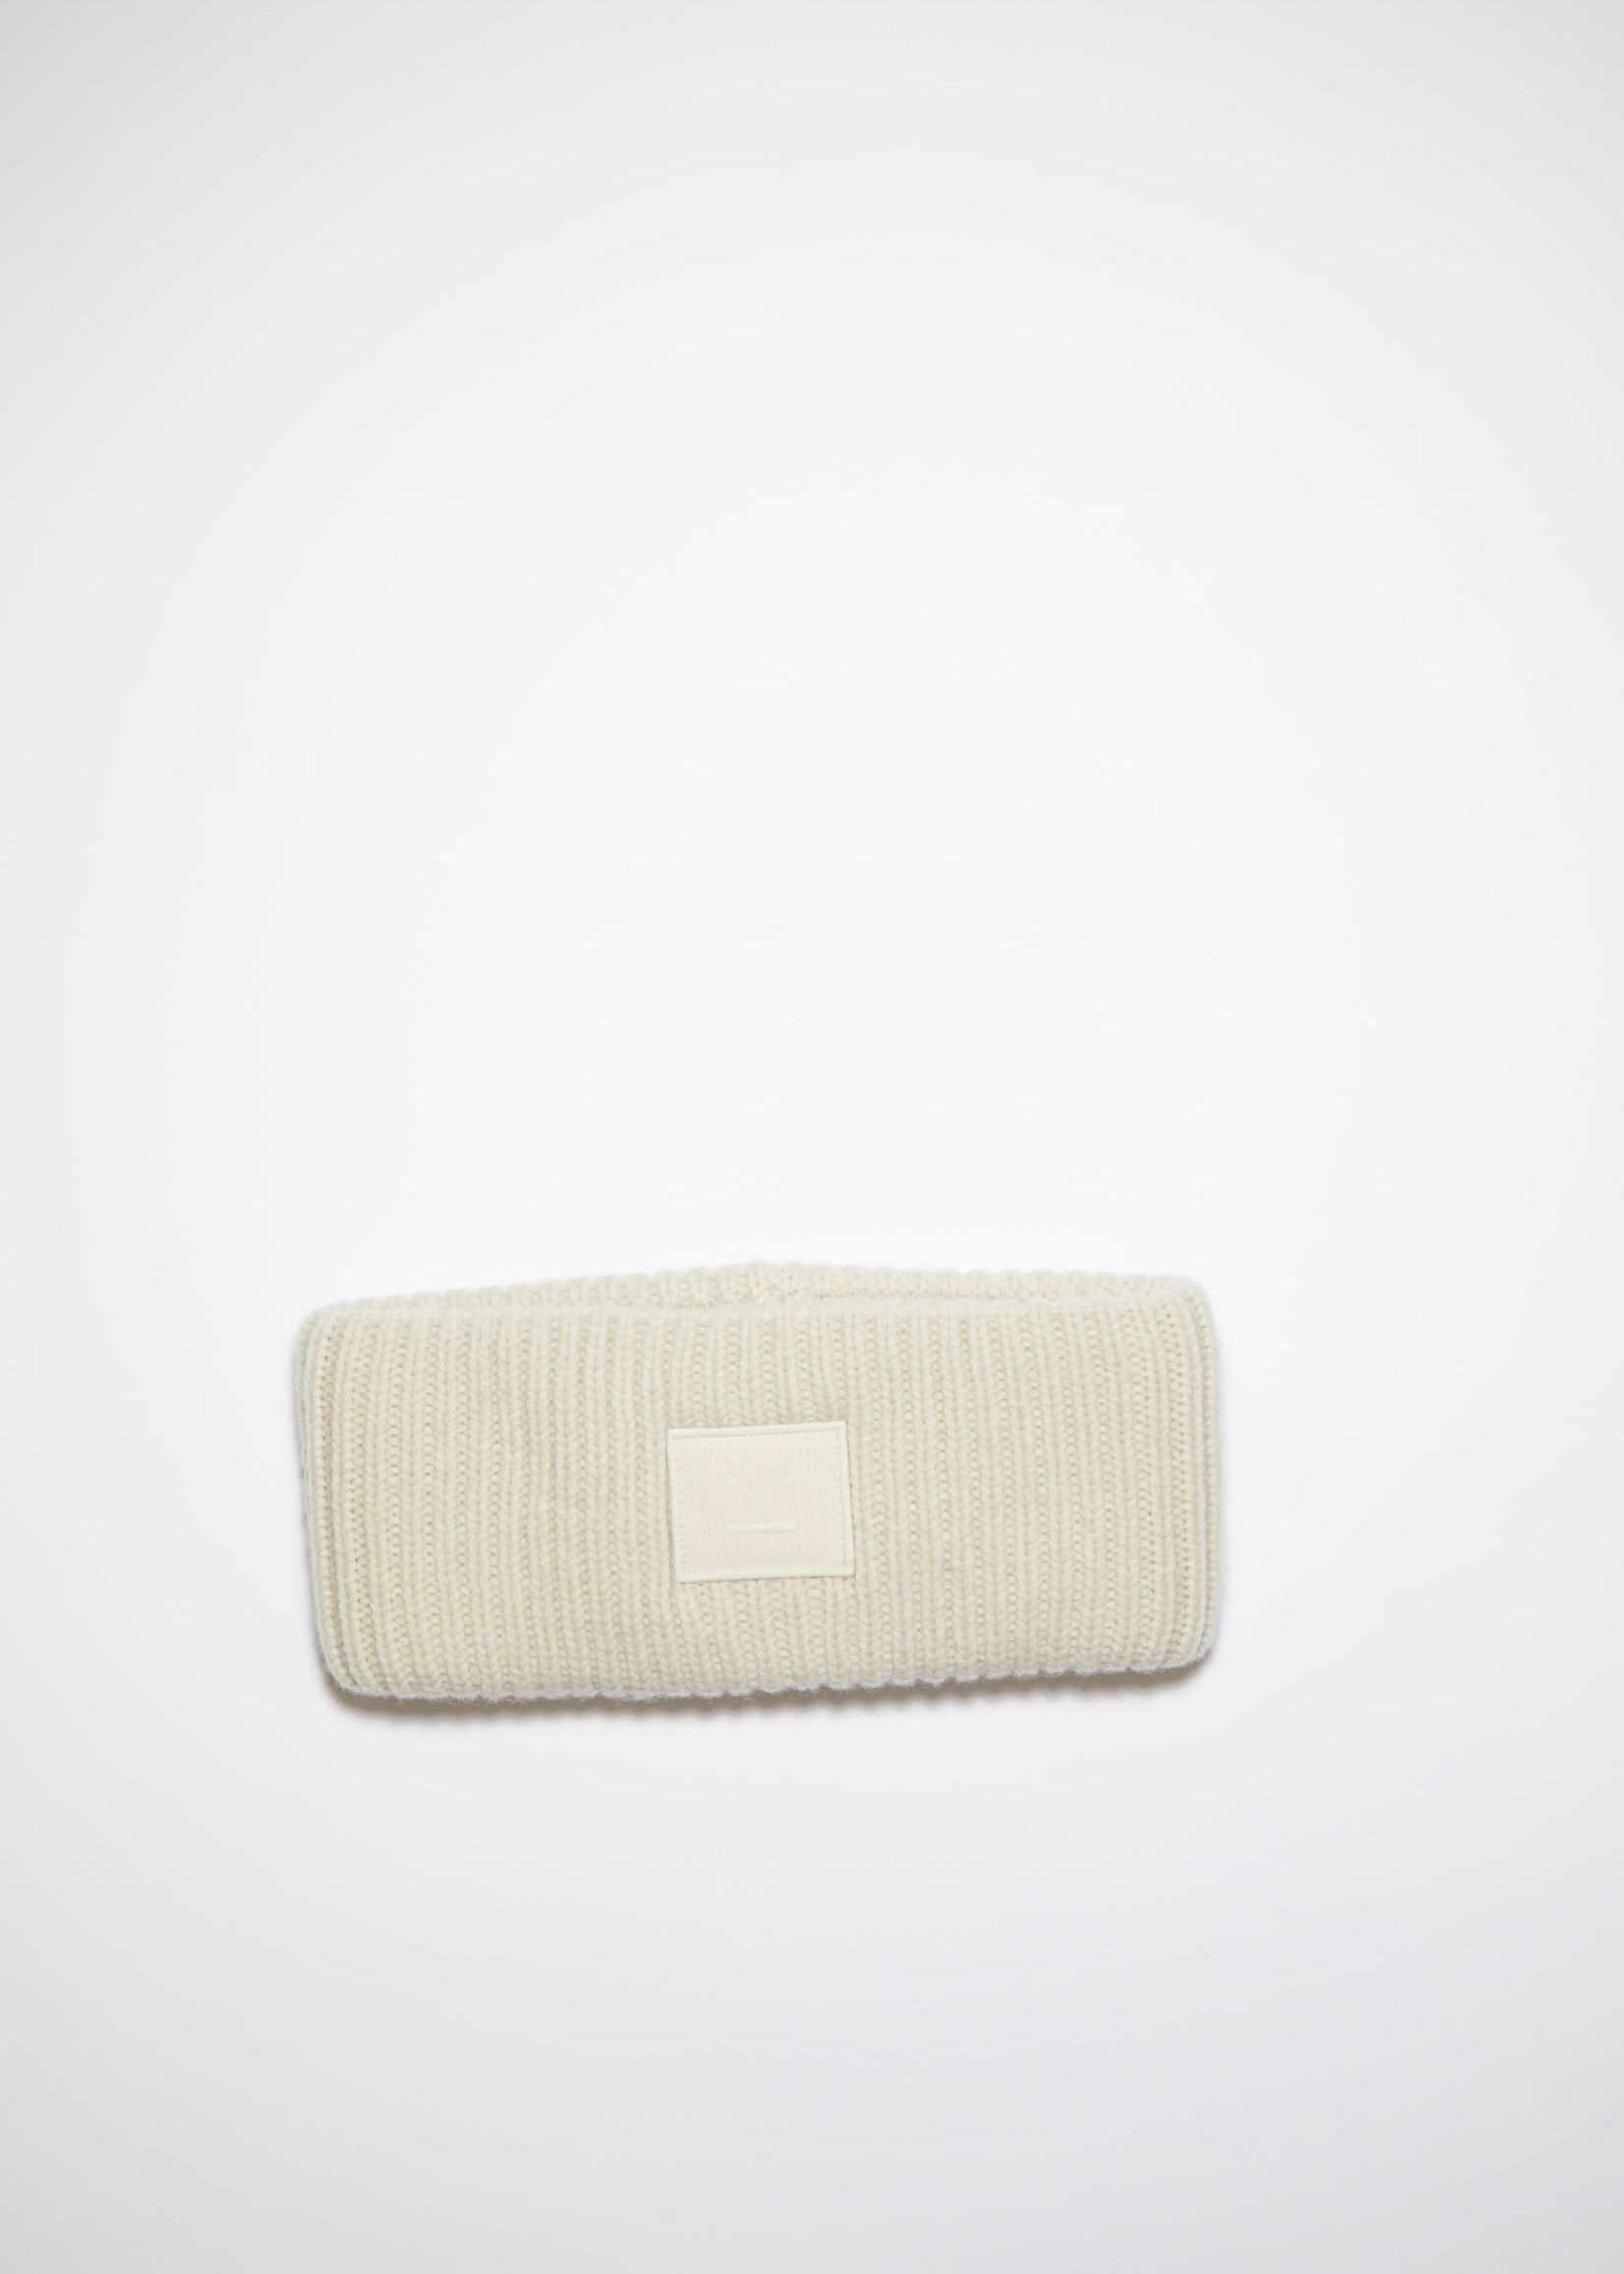 Acnestudios Acnestudios headband fancy face Cream beige